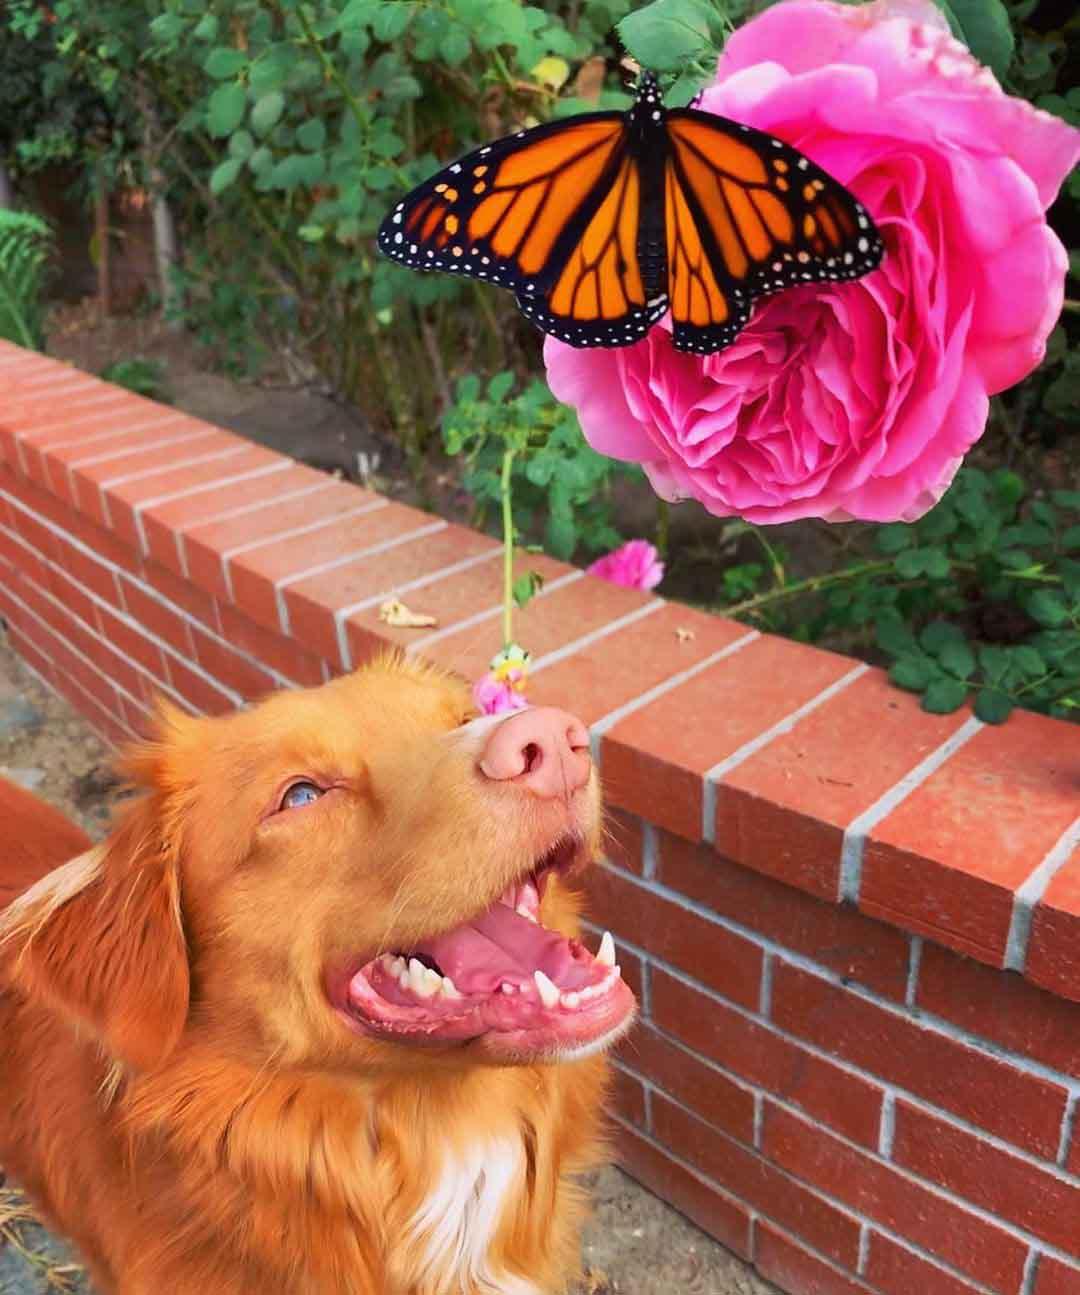 cachorro observa borboleta flor